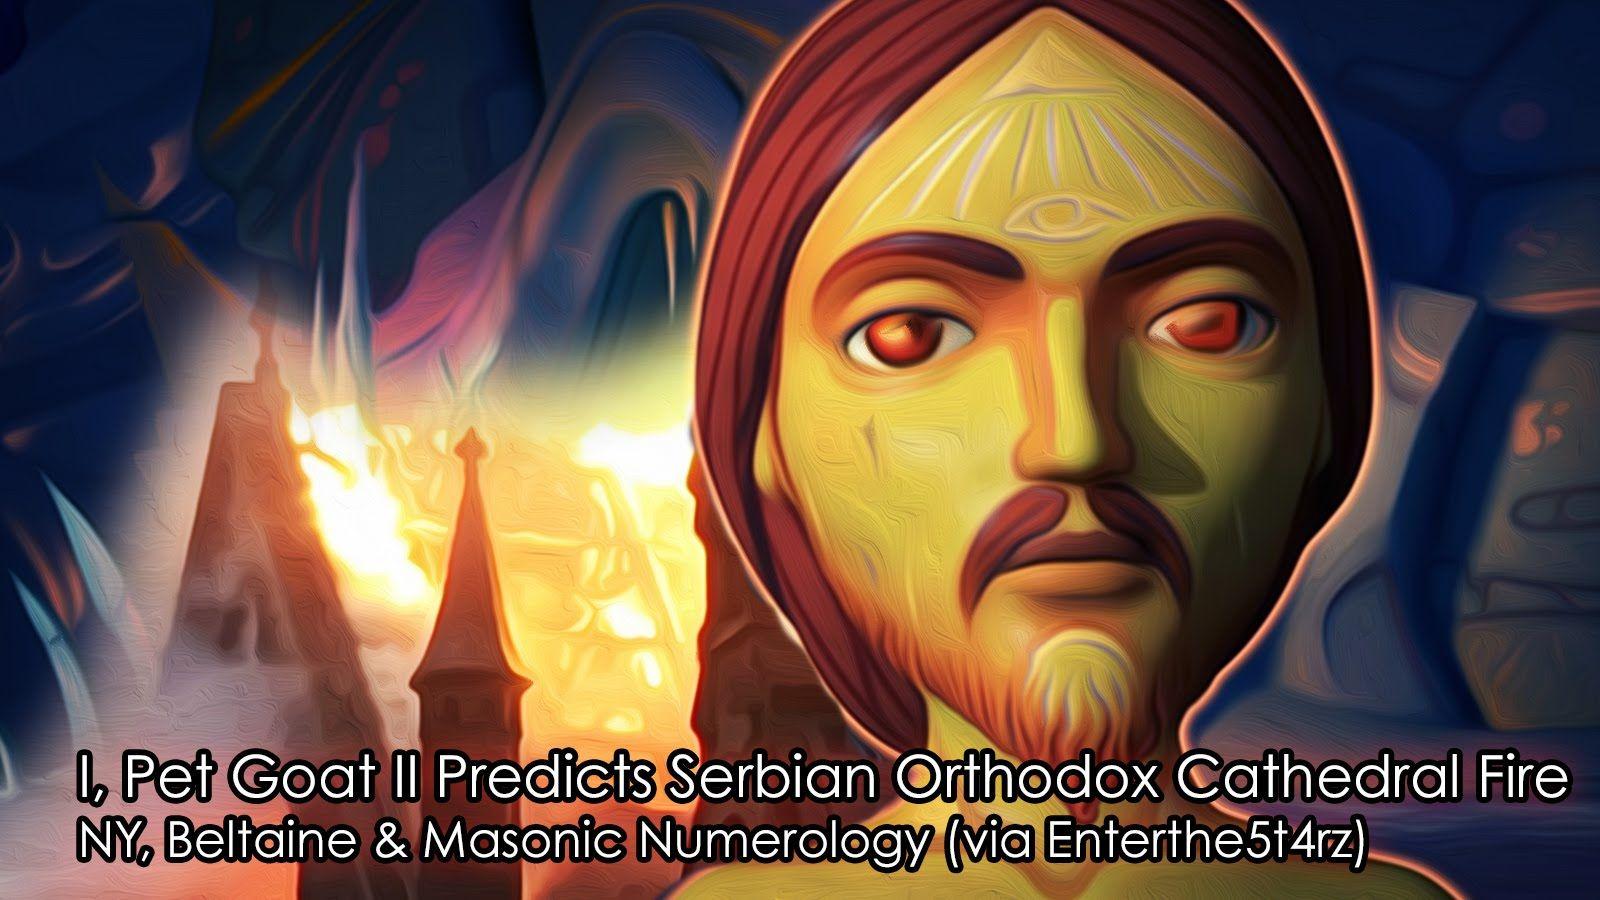 DID 'I, PET GOAT II' PREDICT DESTRUCTIVE FIRE of the Serbian Orthodox Ch...